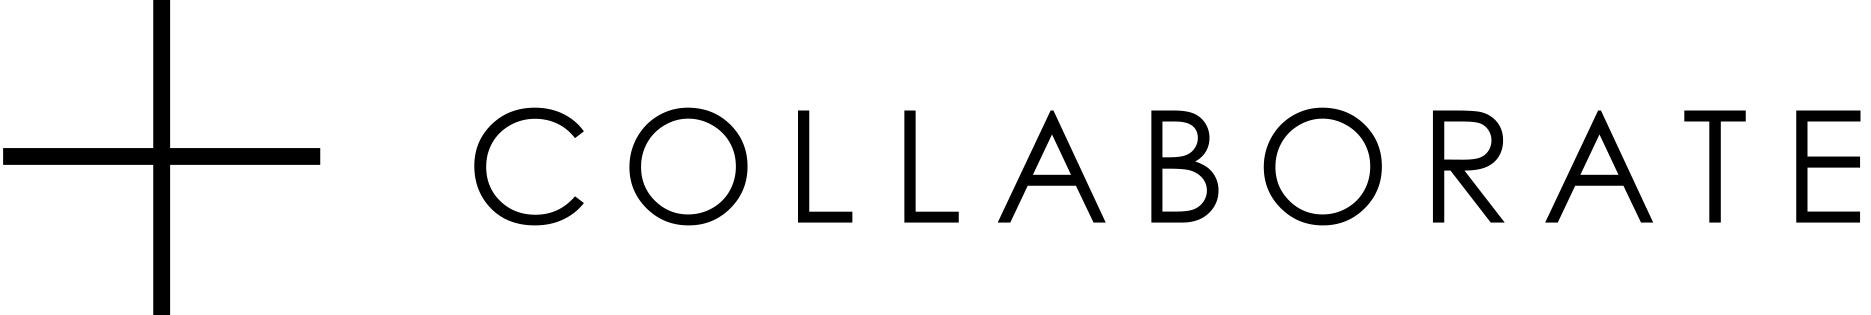 +COLLABORATEのロゴマーク